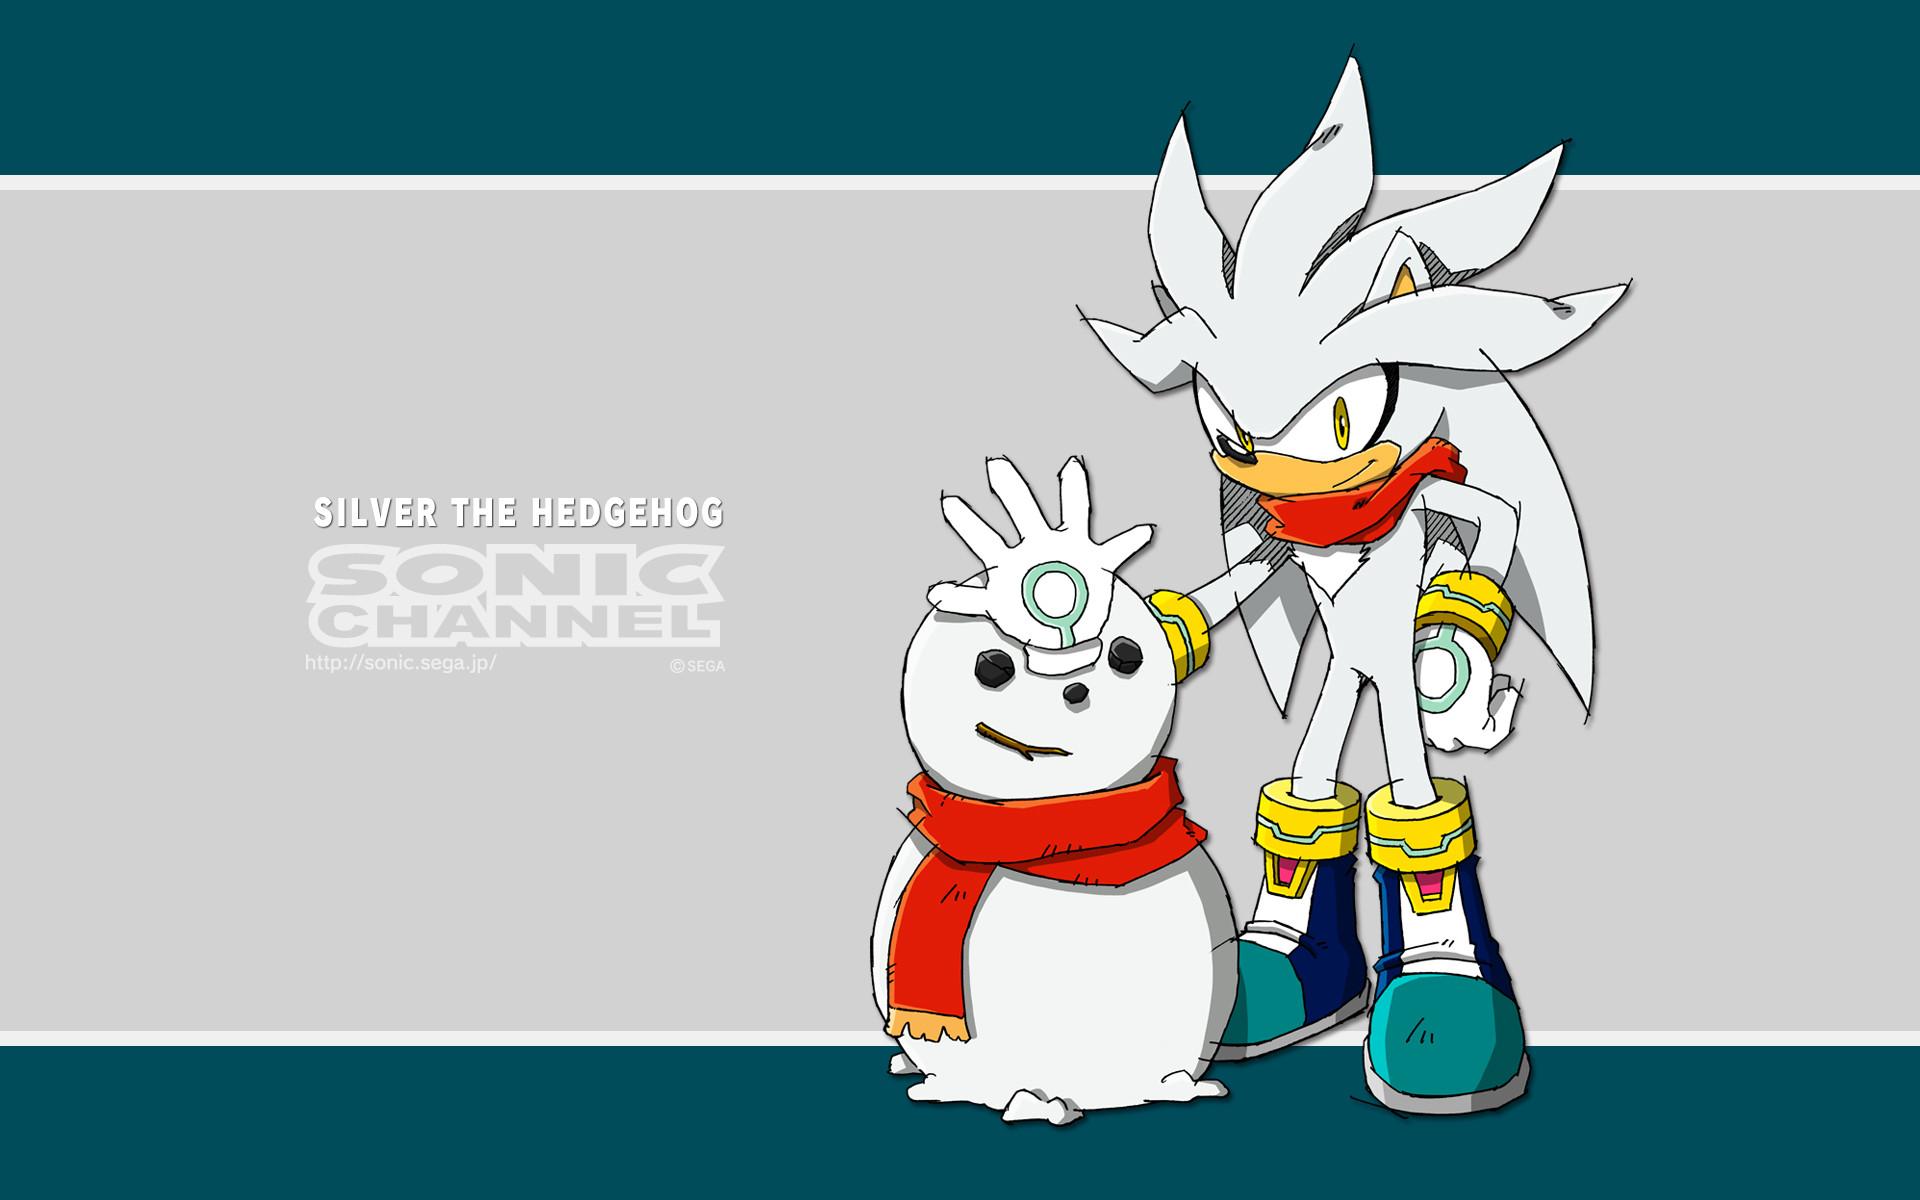 2014/01 — Silver the Hedgehog